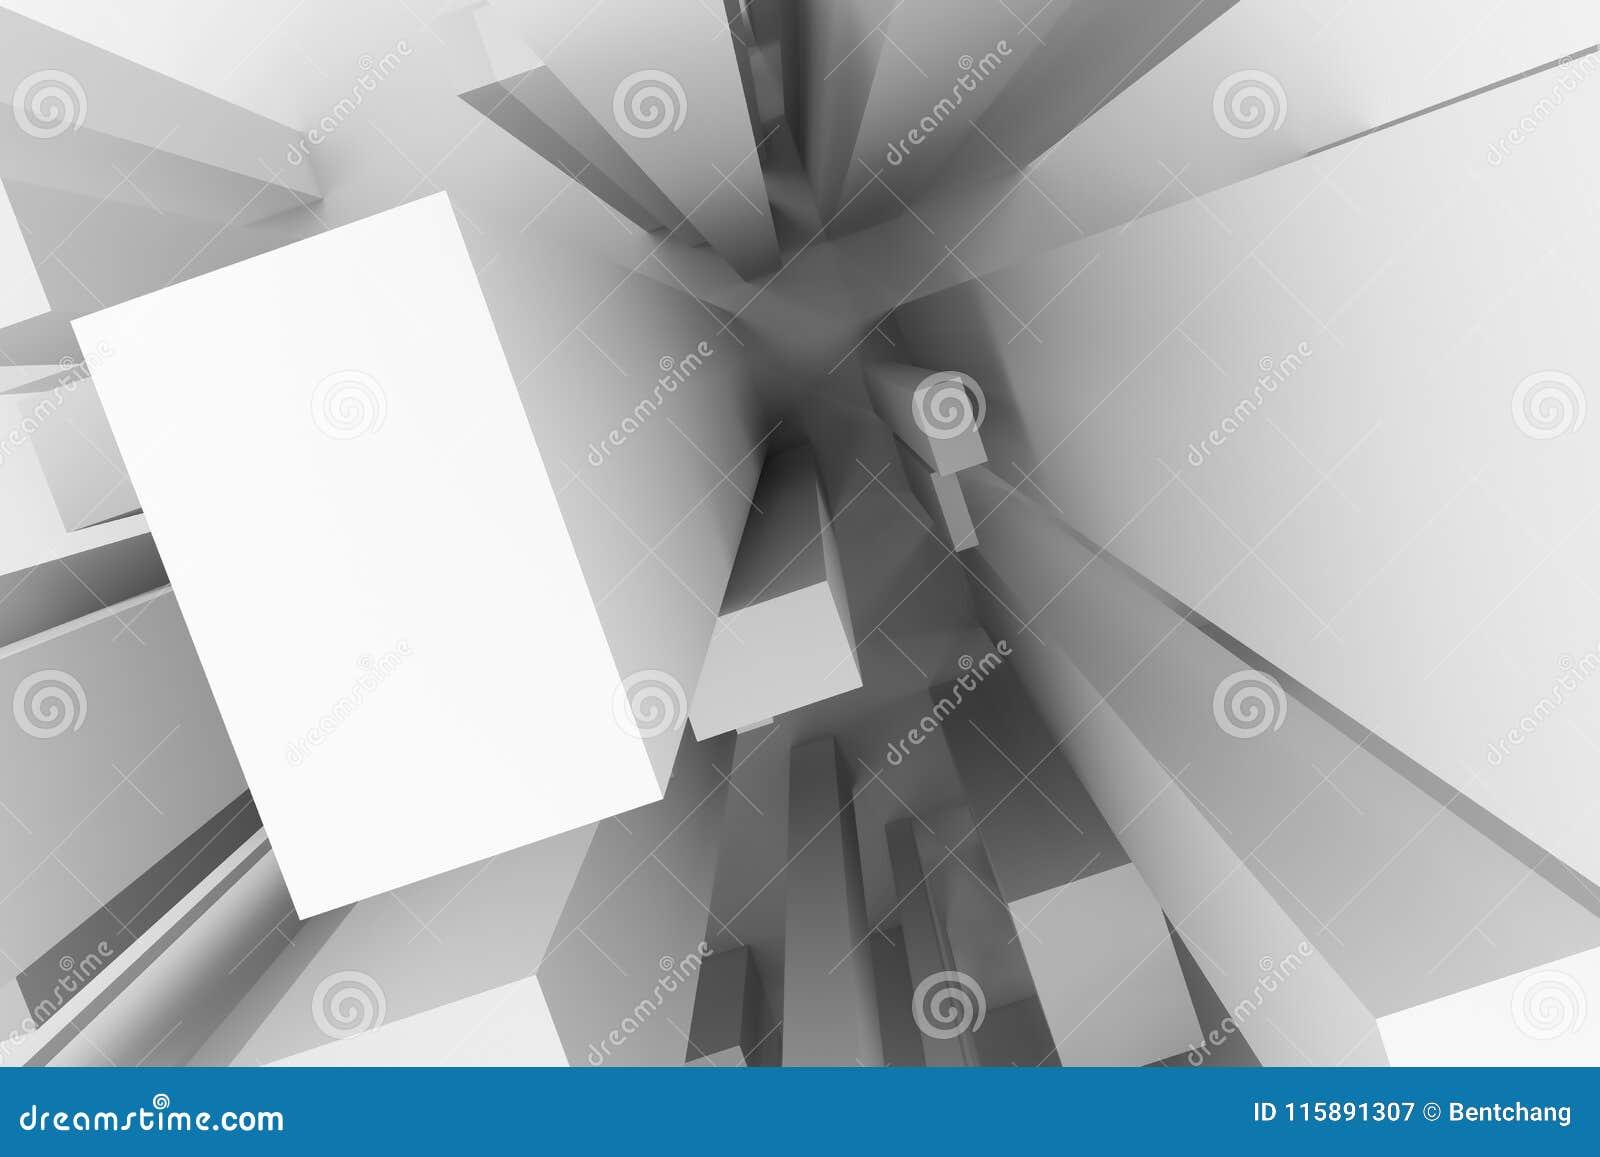 Abstract Modern Pillar Style Soft White Gray Background Pattern Artwork Wallpaper